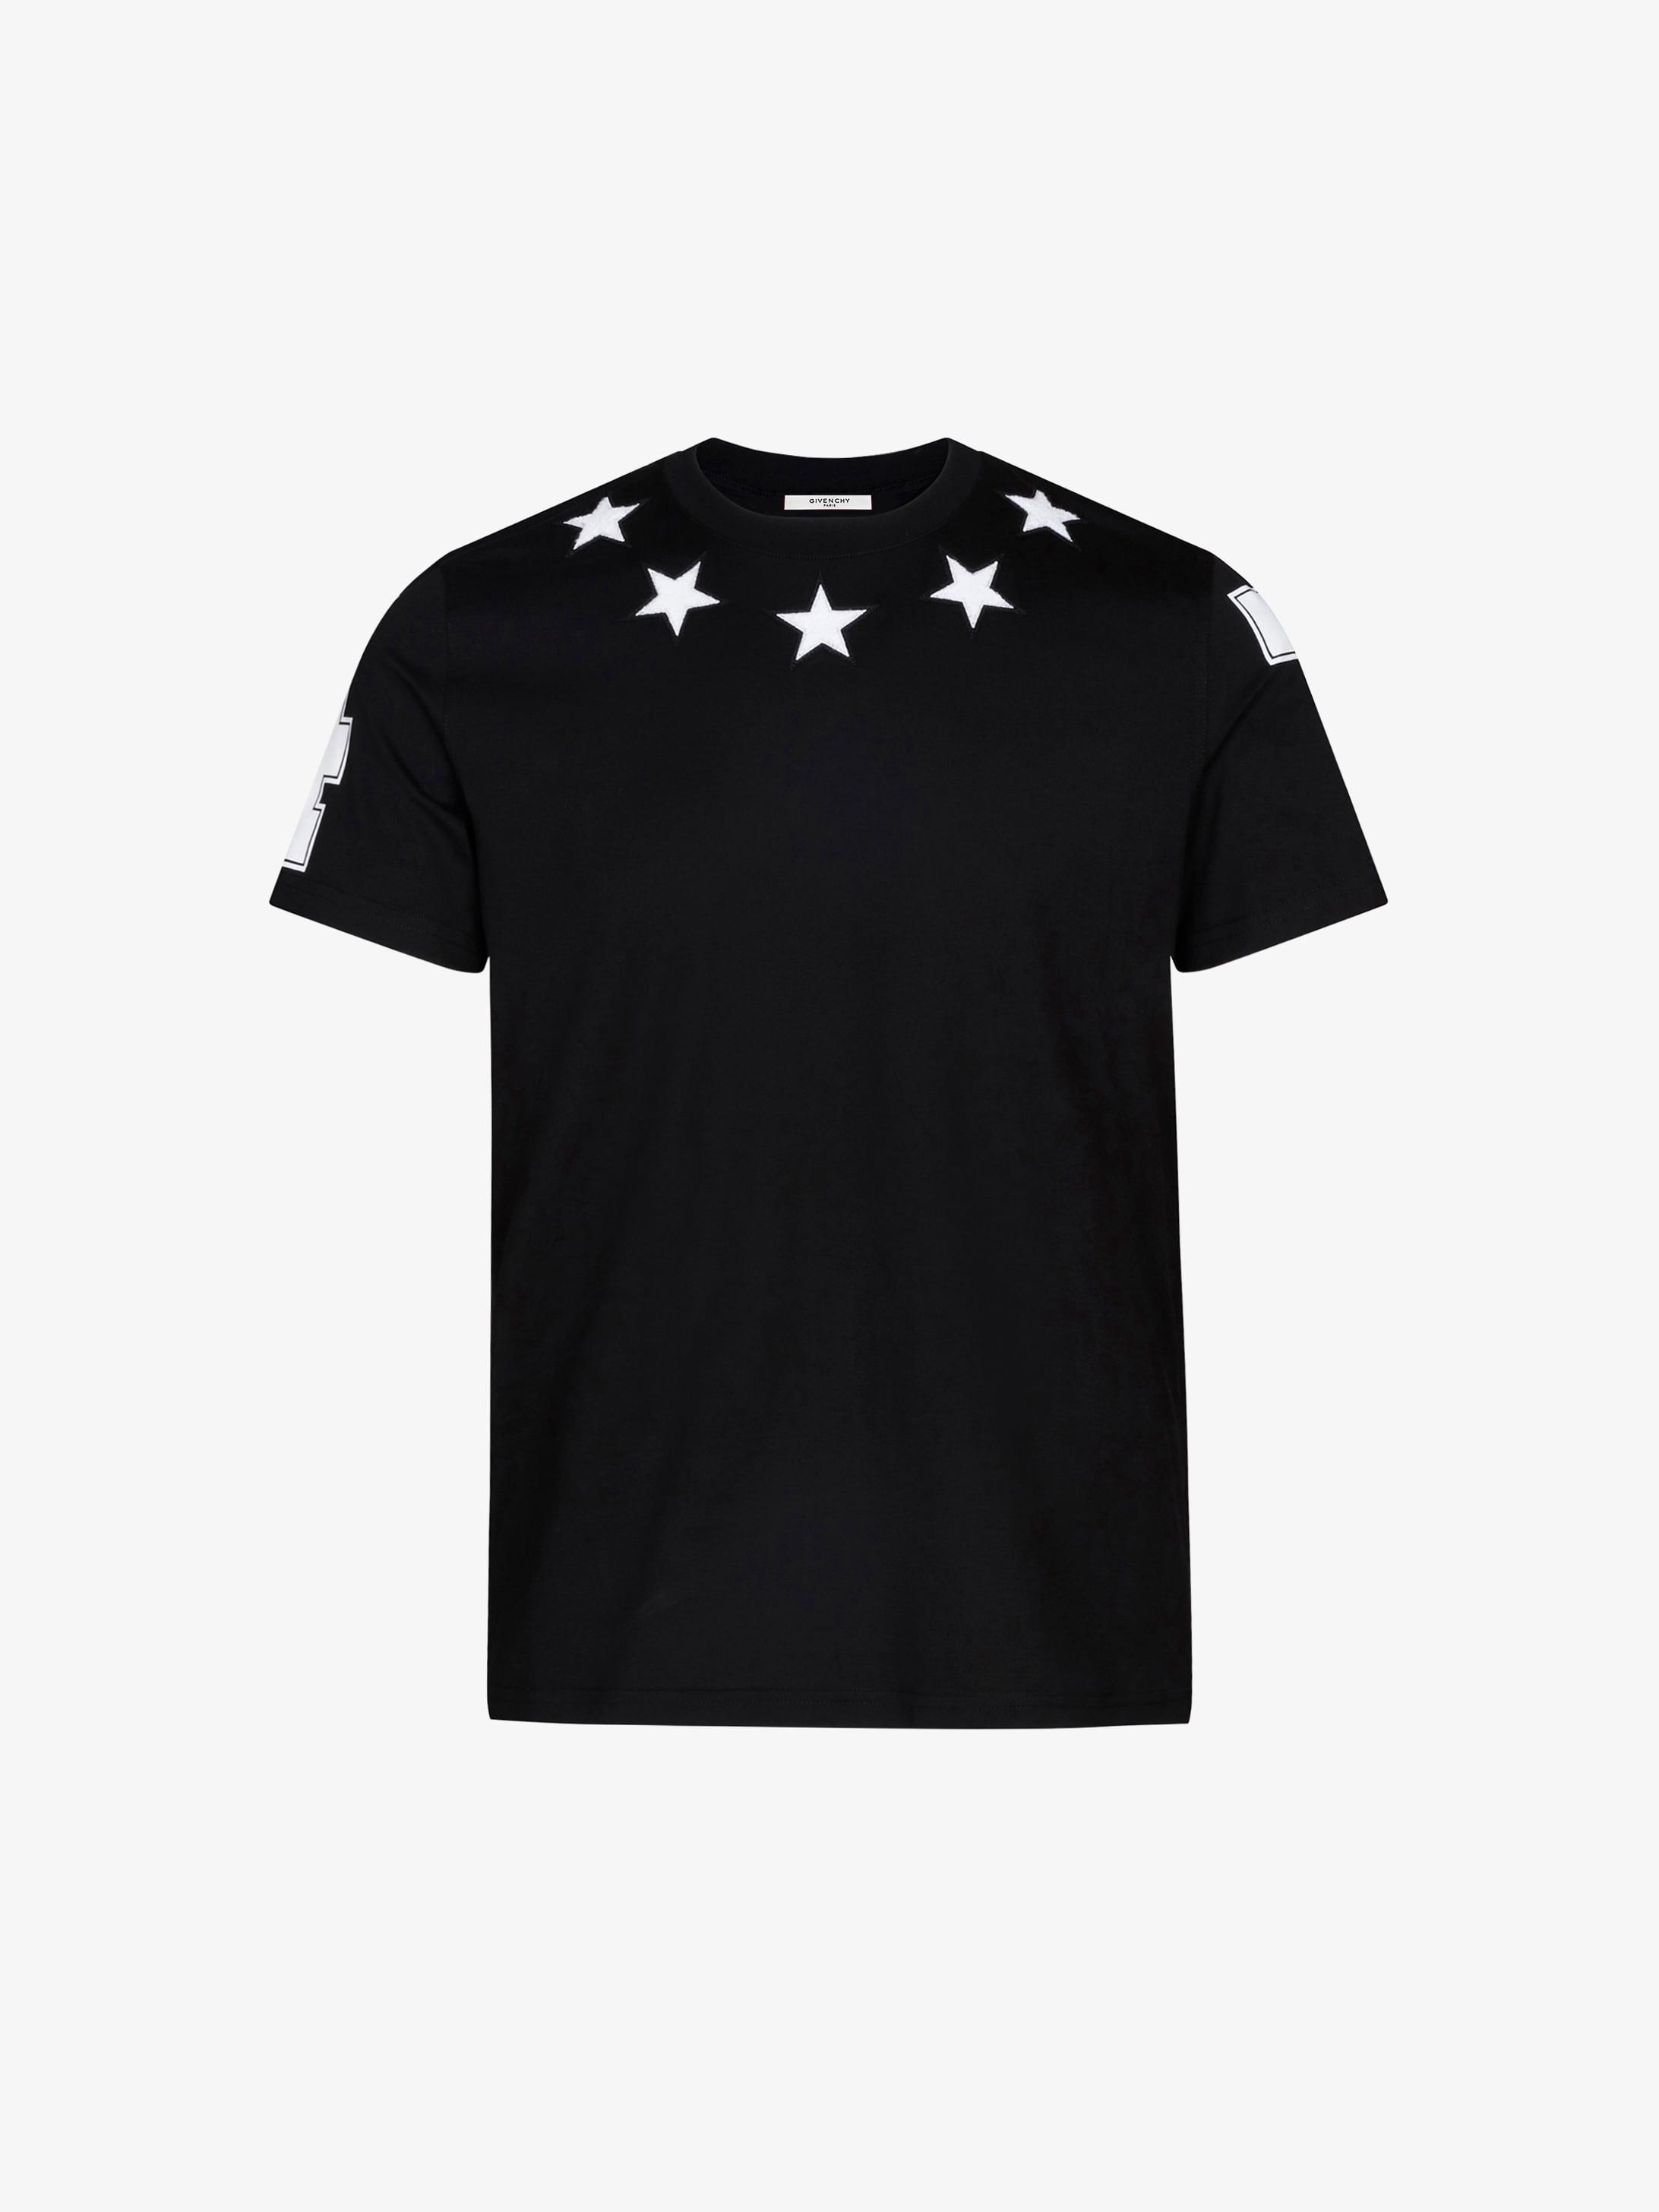 五角星、7、4图案T恤